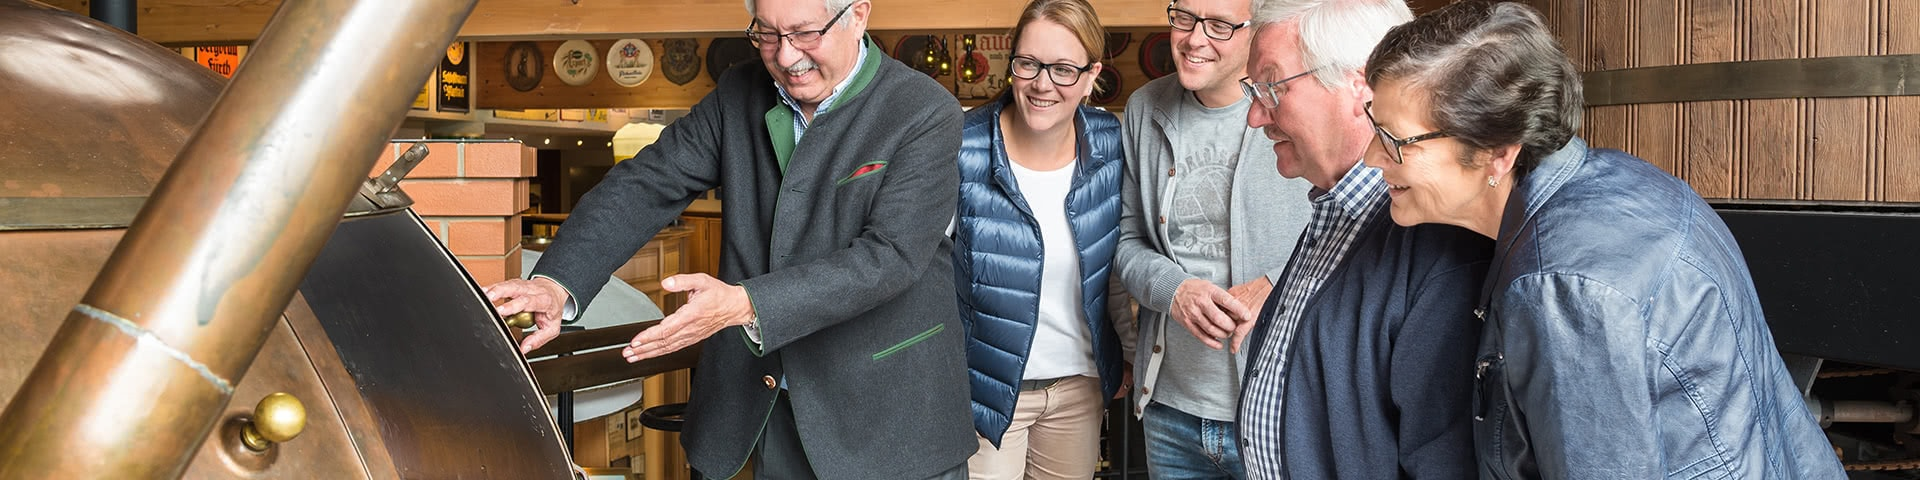 Brauereiführung in der Potts Brauerei in Oelde